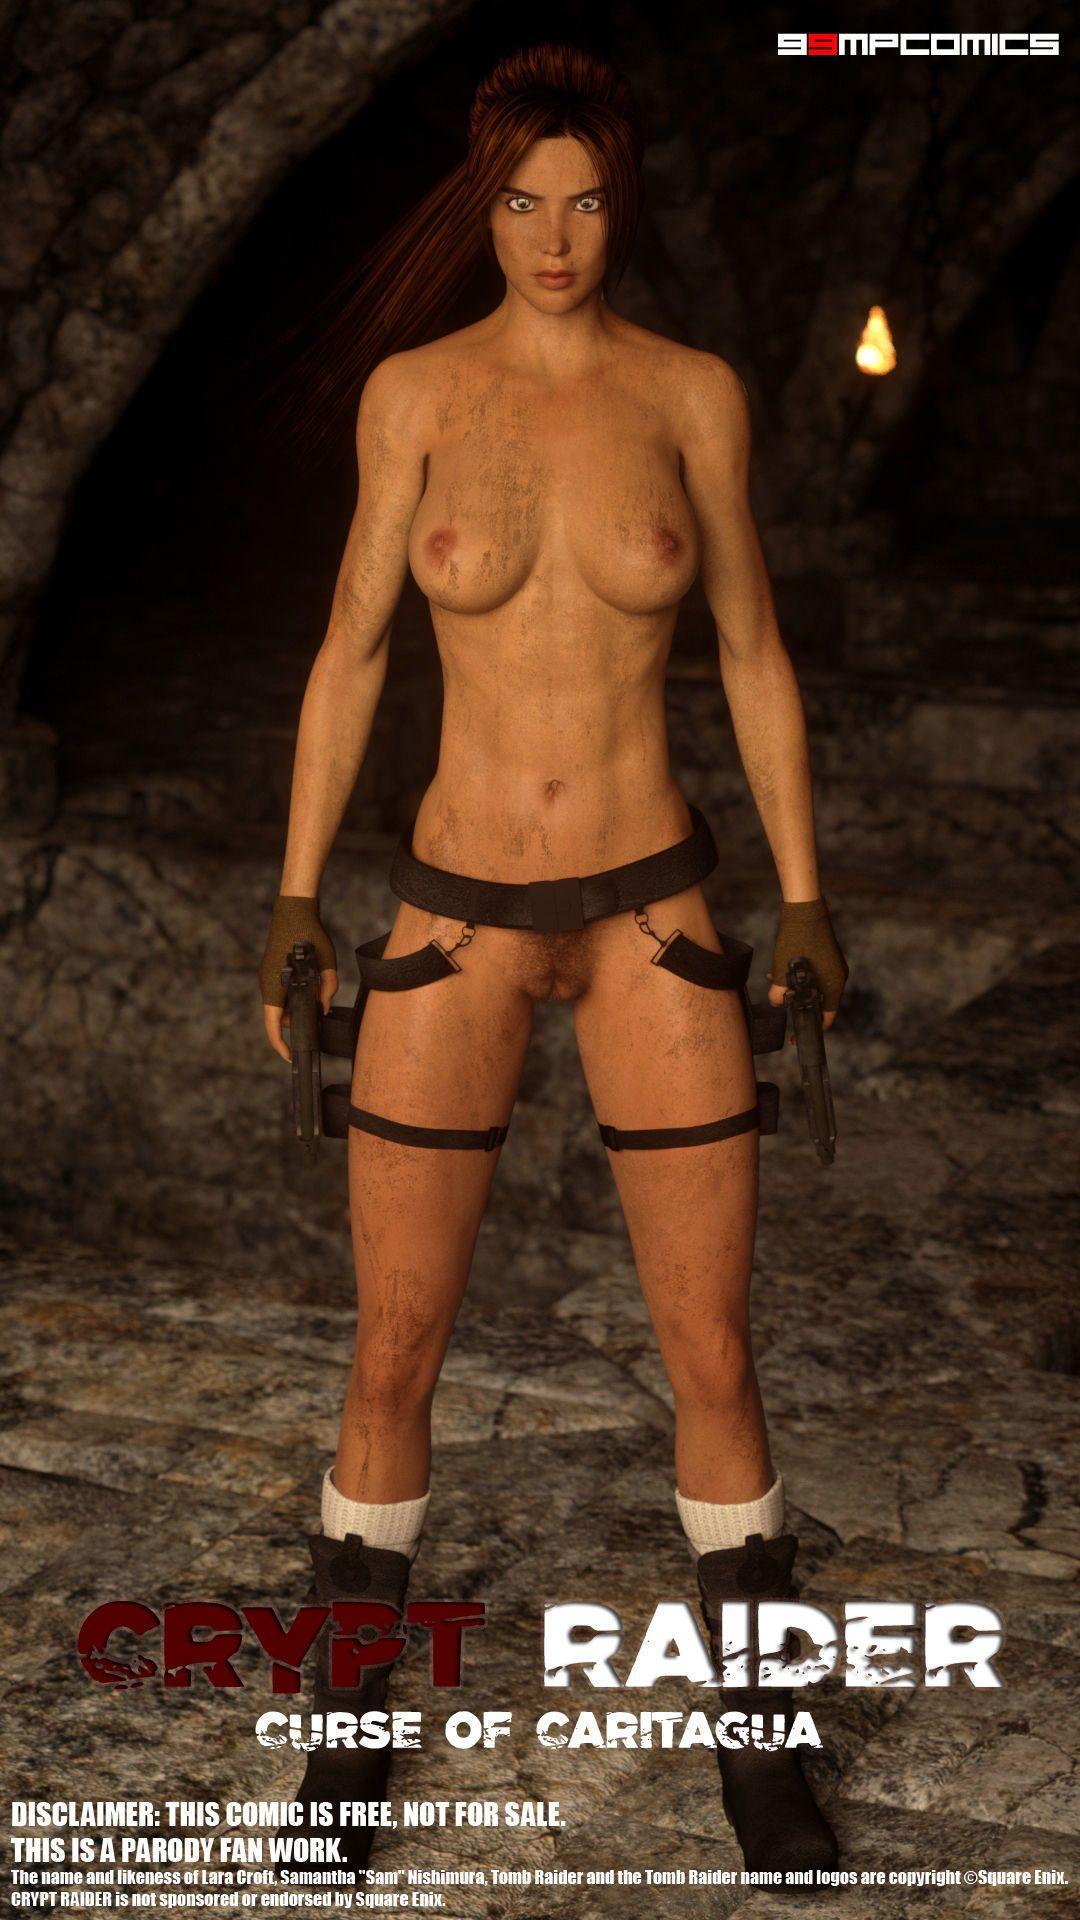 Crypt Raider